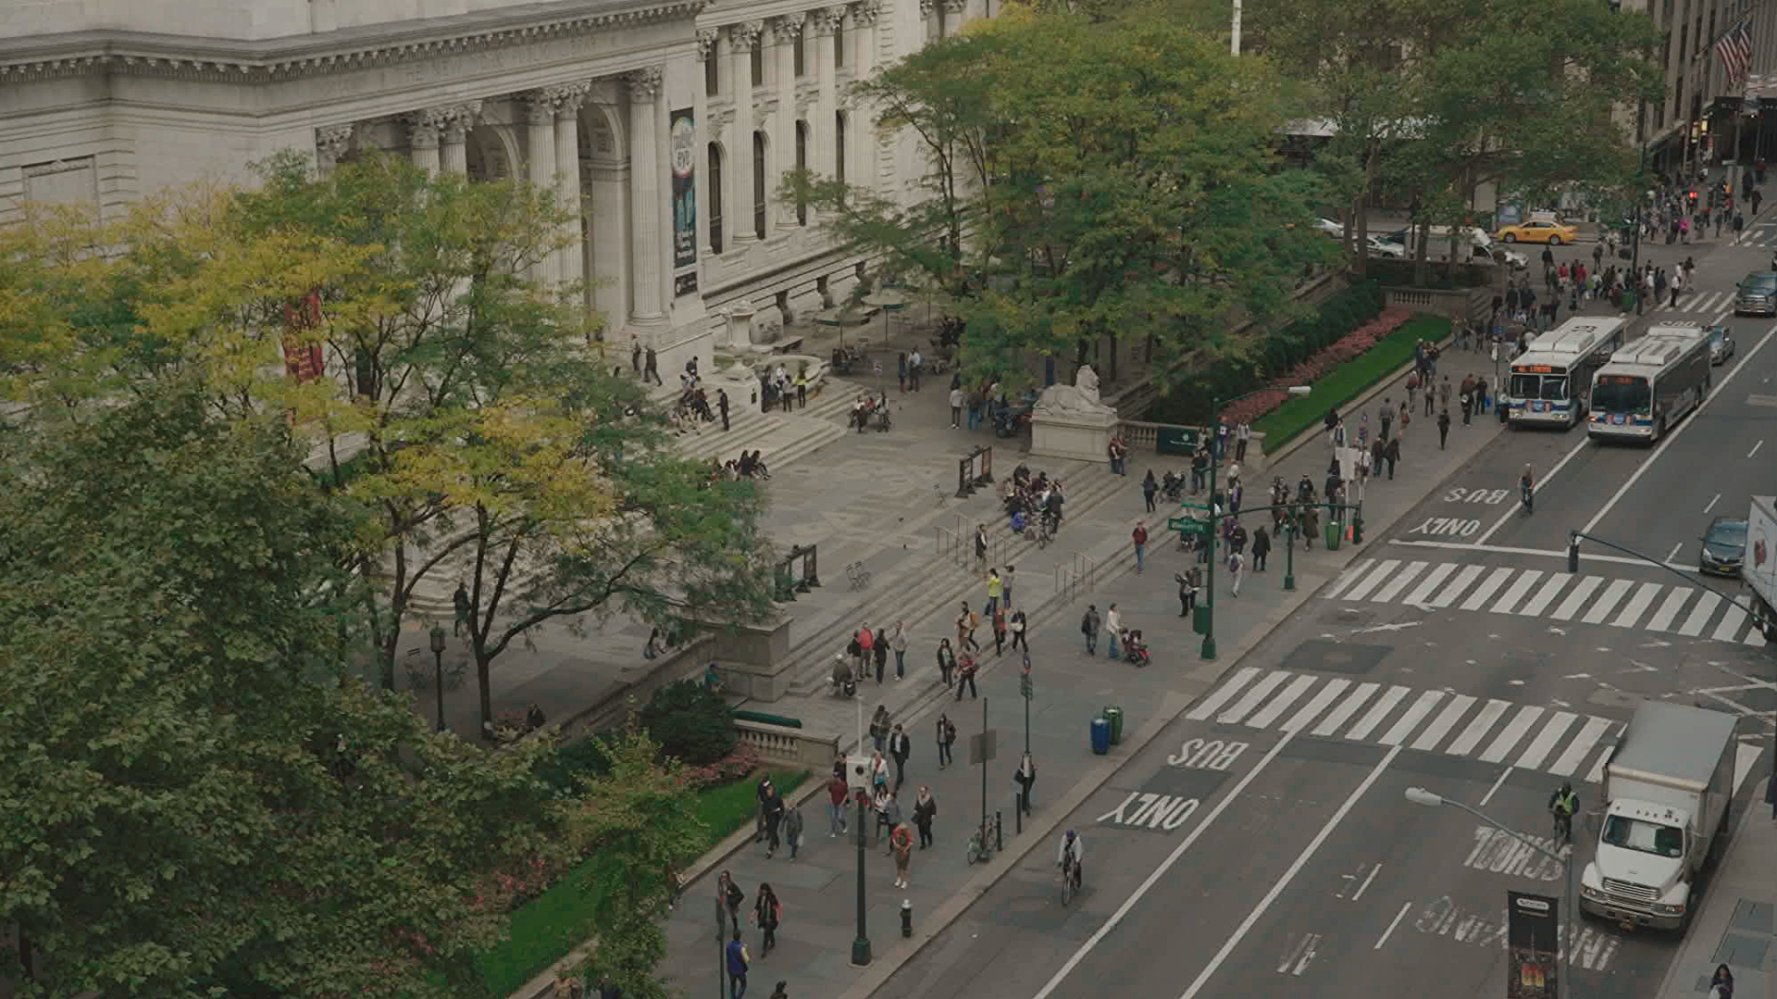 Ex Libris: The New York Public Library – new documentary from legendary filmmaker Frederick Wiseman (September 29 – October 5)